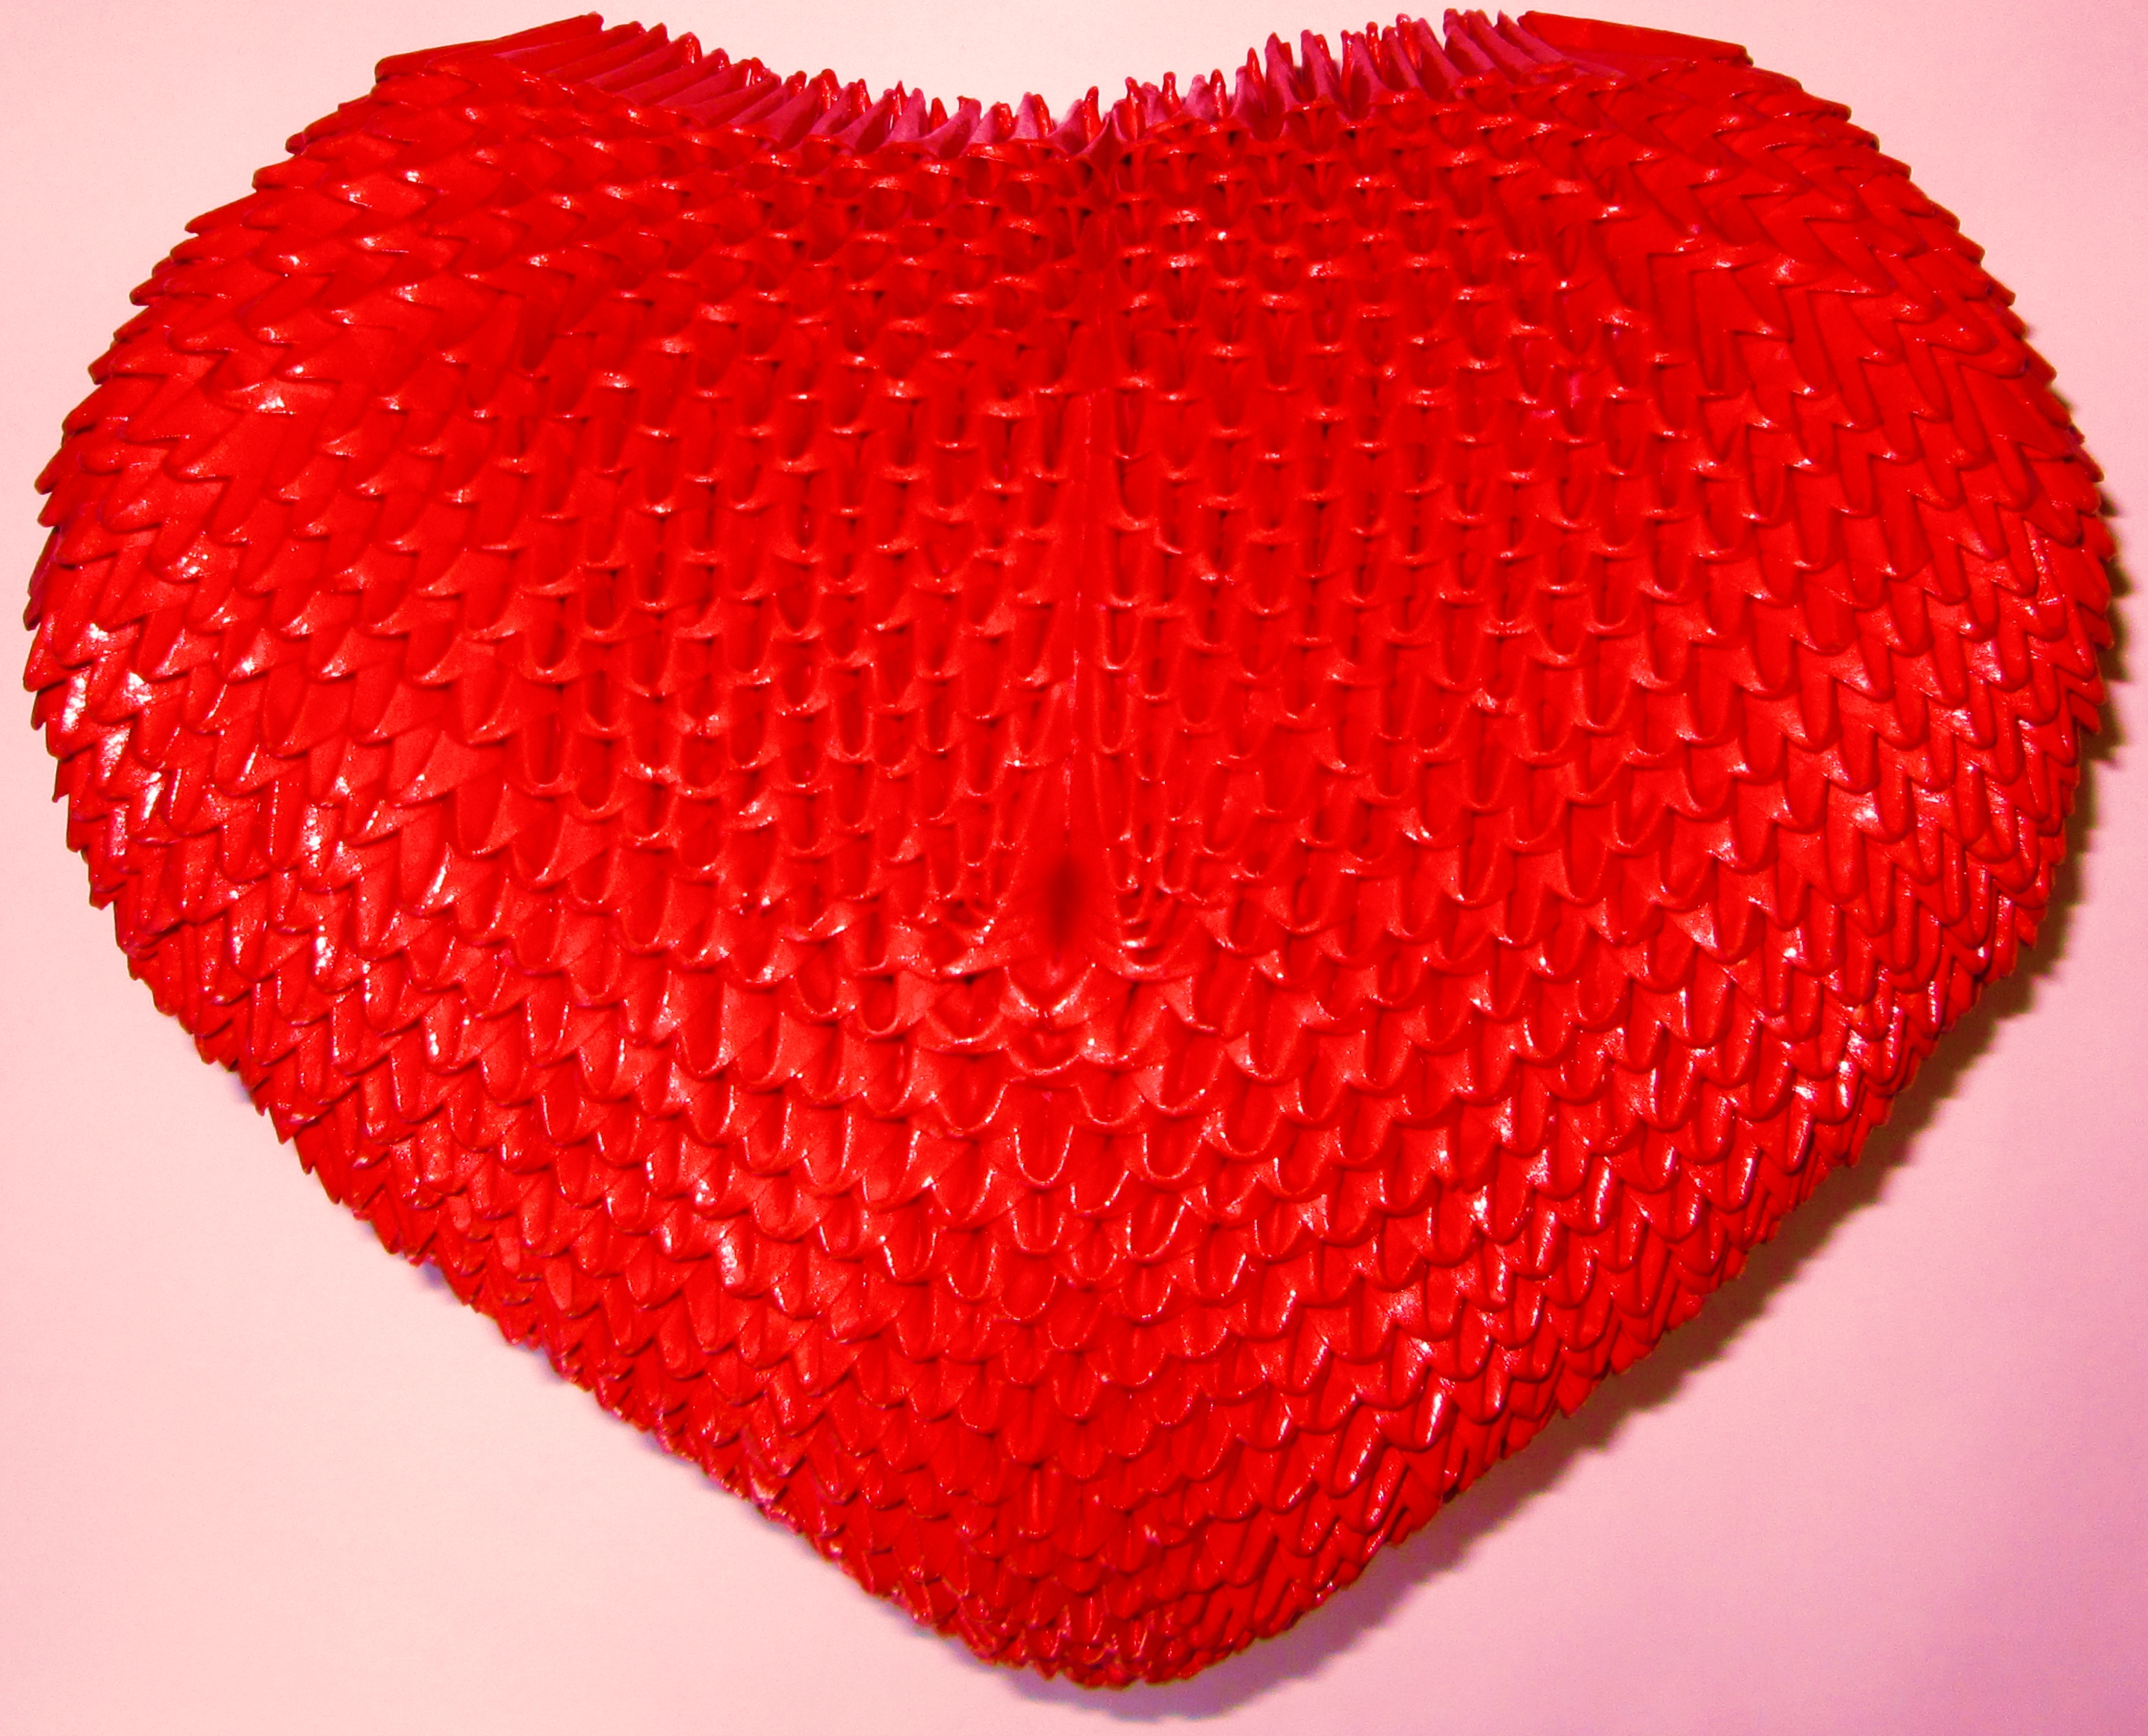 3d OrigaMI HEART by Floorin333 on DeviantArt - photo#9